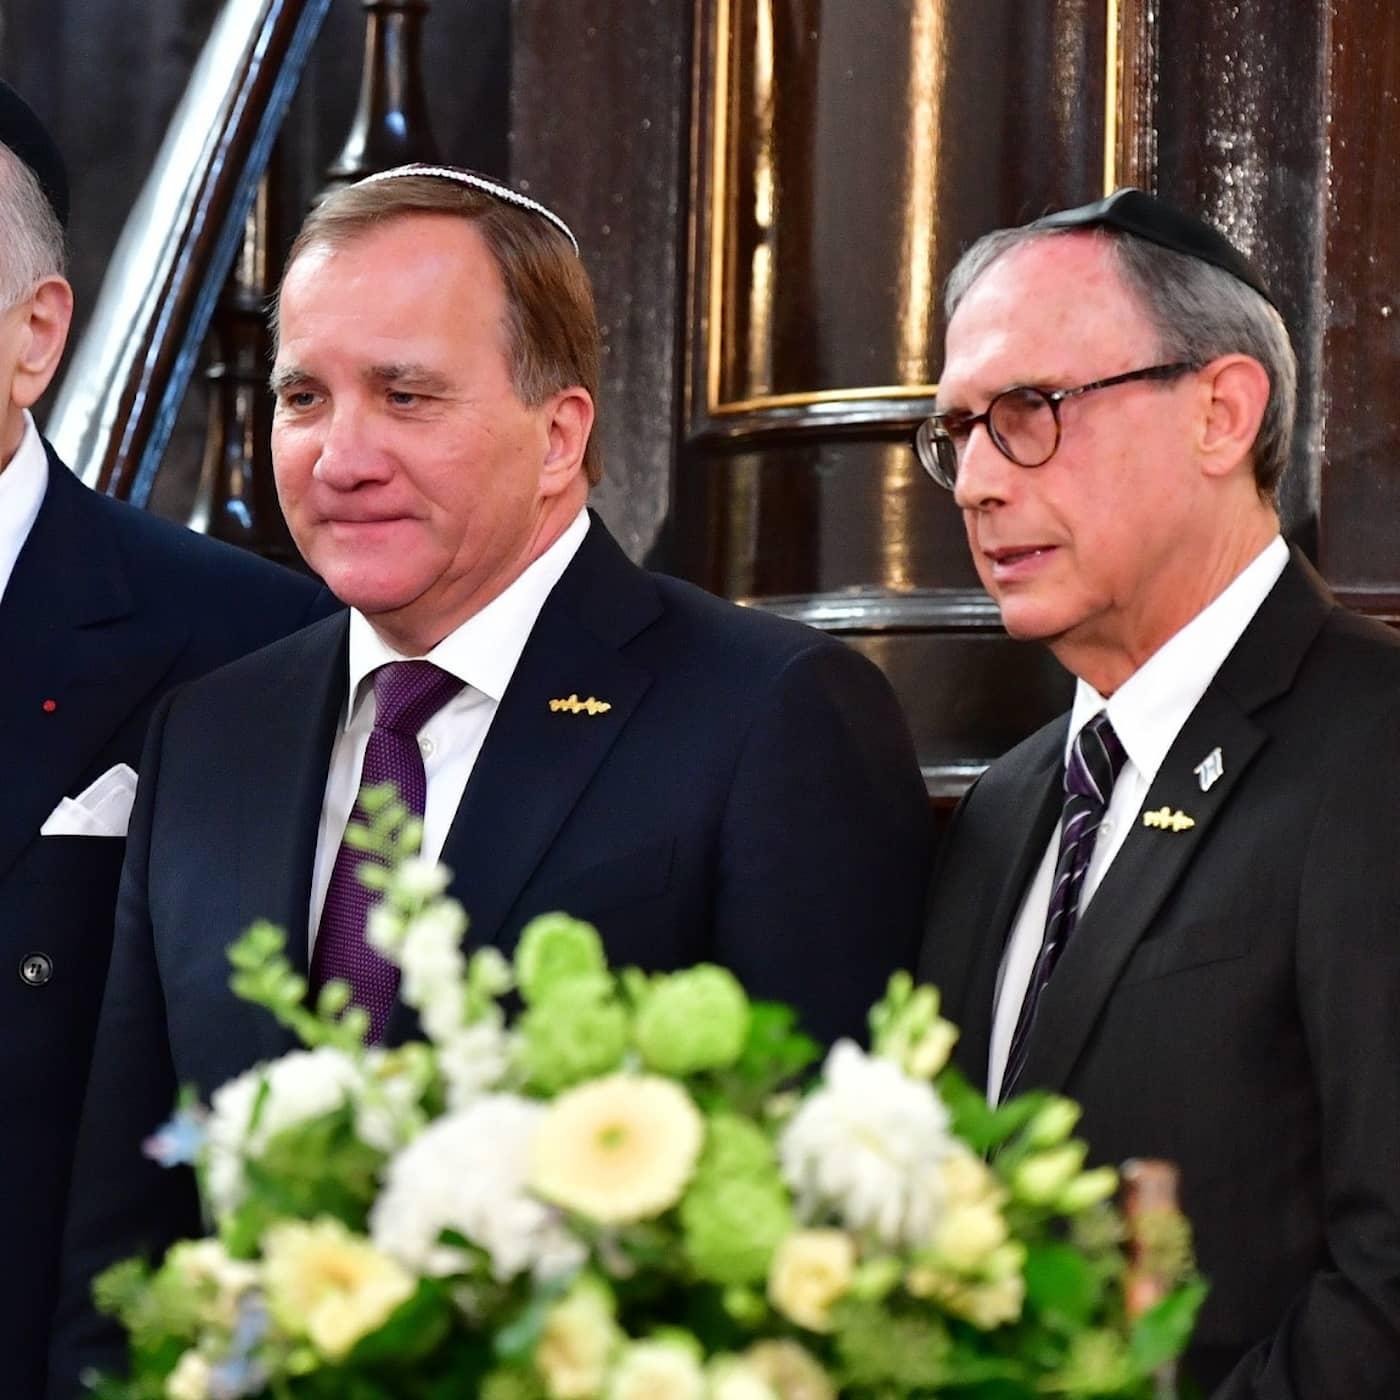 Radio Sweden Weekly: Holocaust Forum on combating anti-Semitism